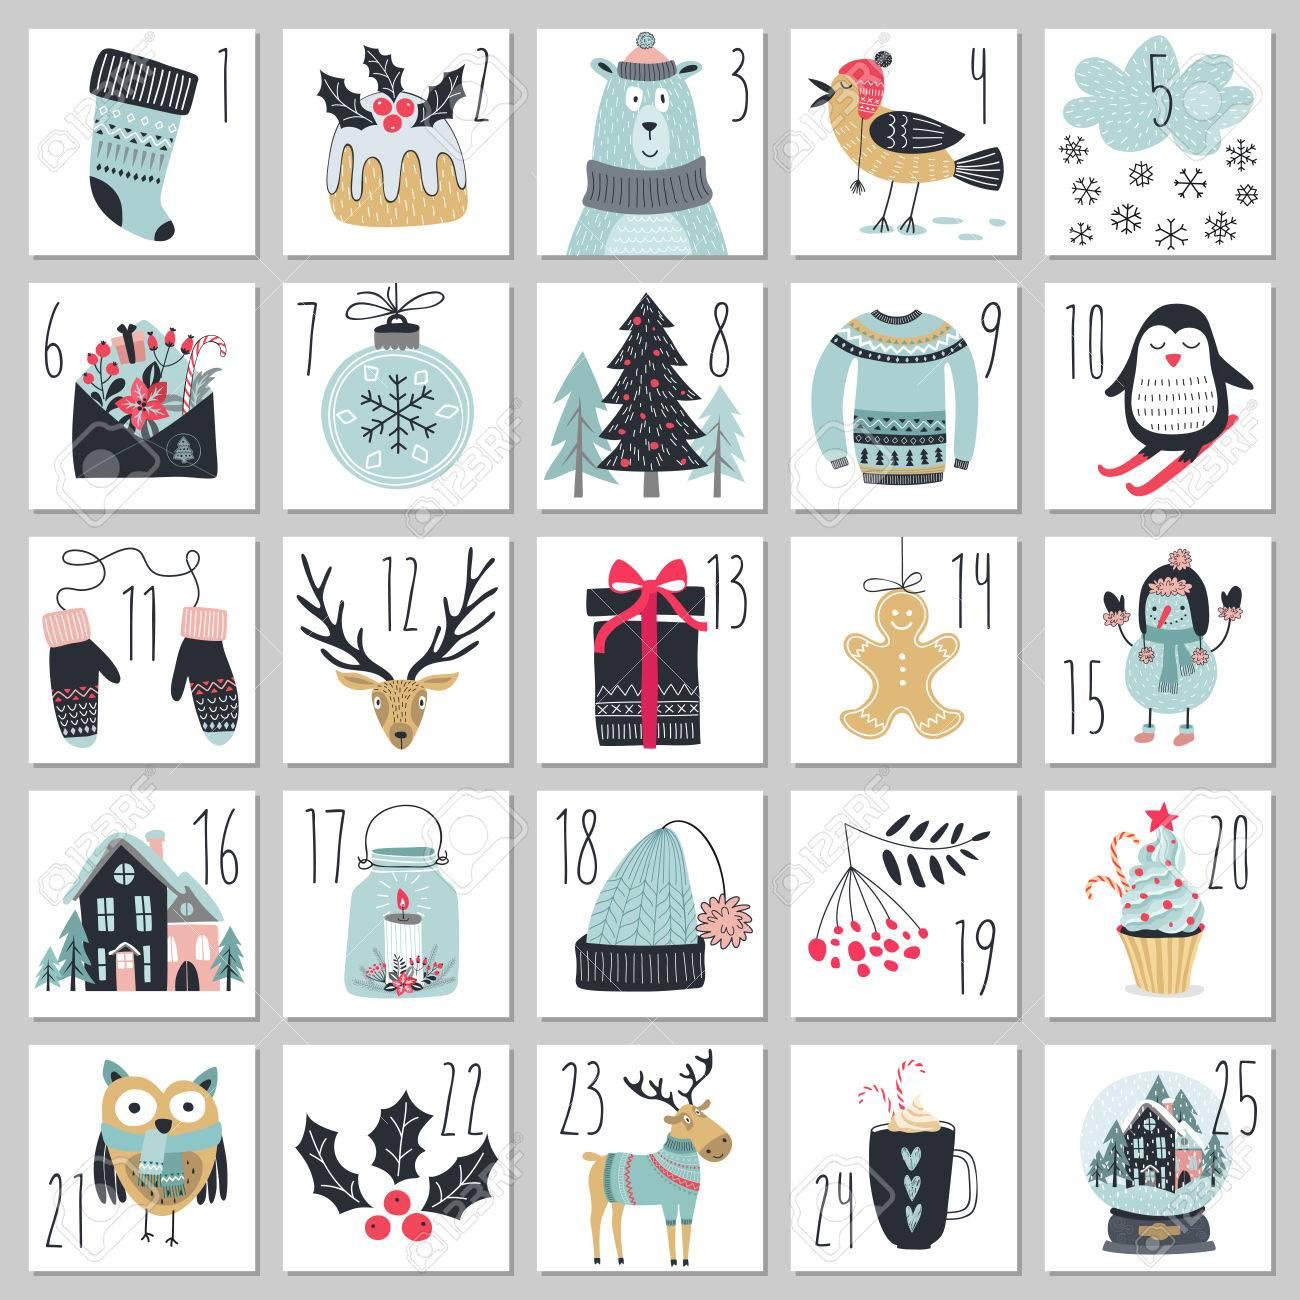 Christmas advent calendar, hand drawn style. Vector illustration. - 67582715